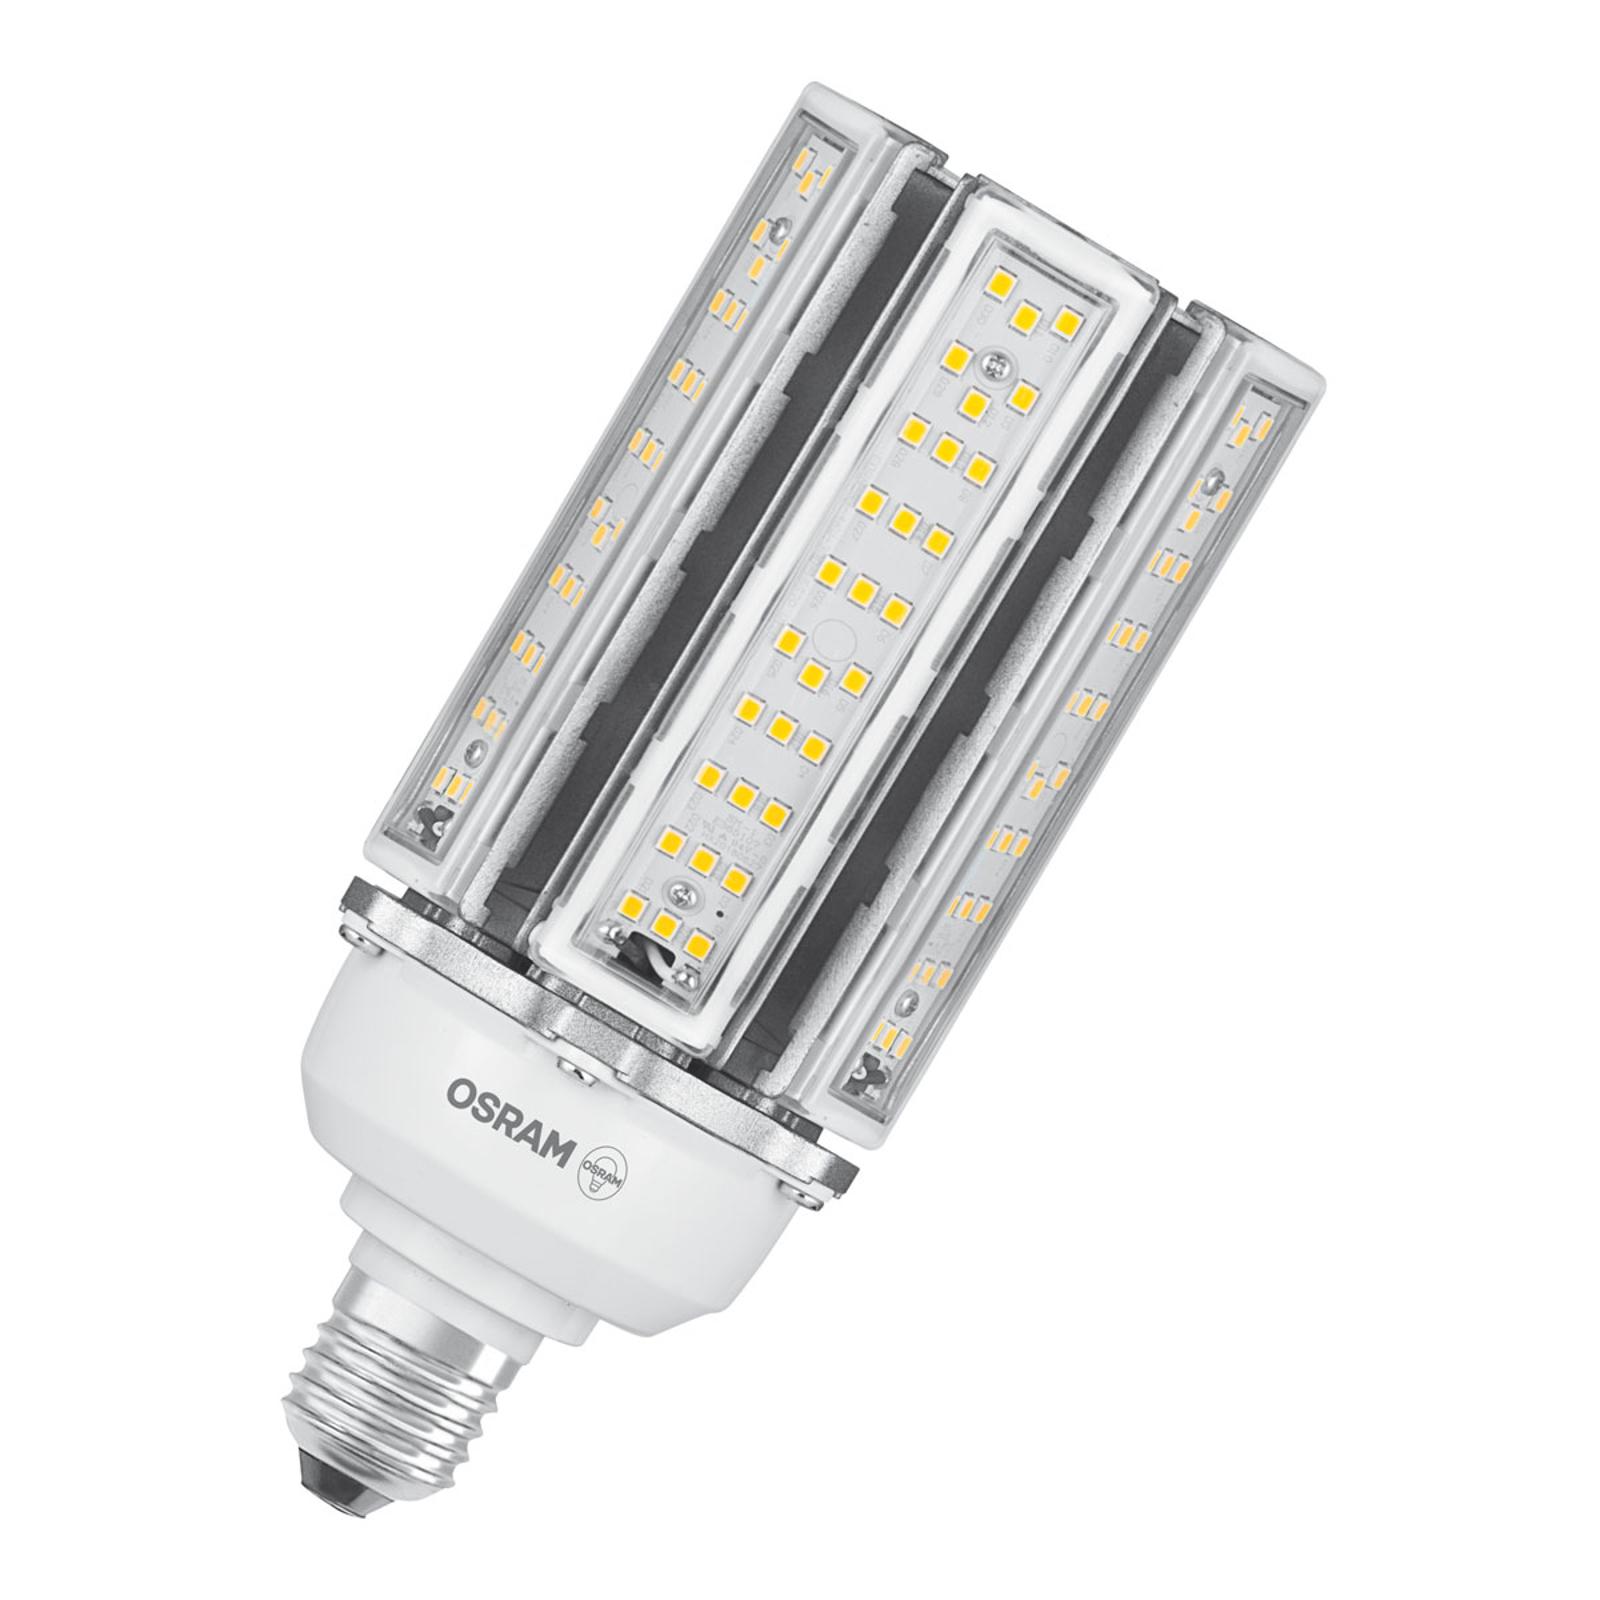 OSRAM lampadina LED E27 Parathom HQL 46W 4.000K